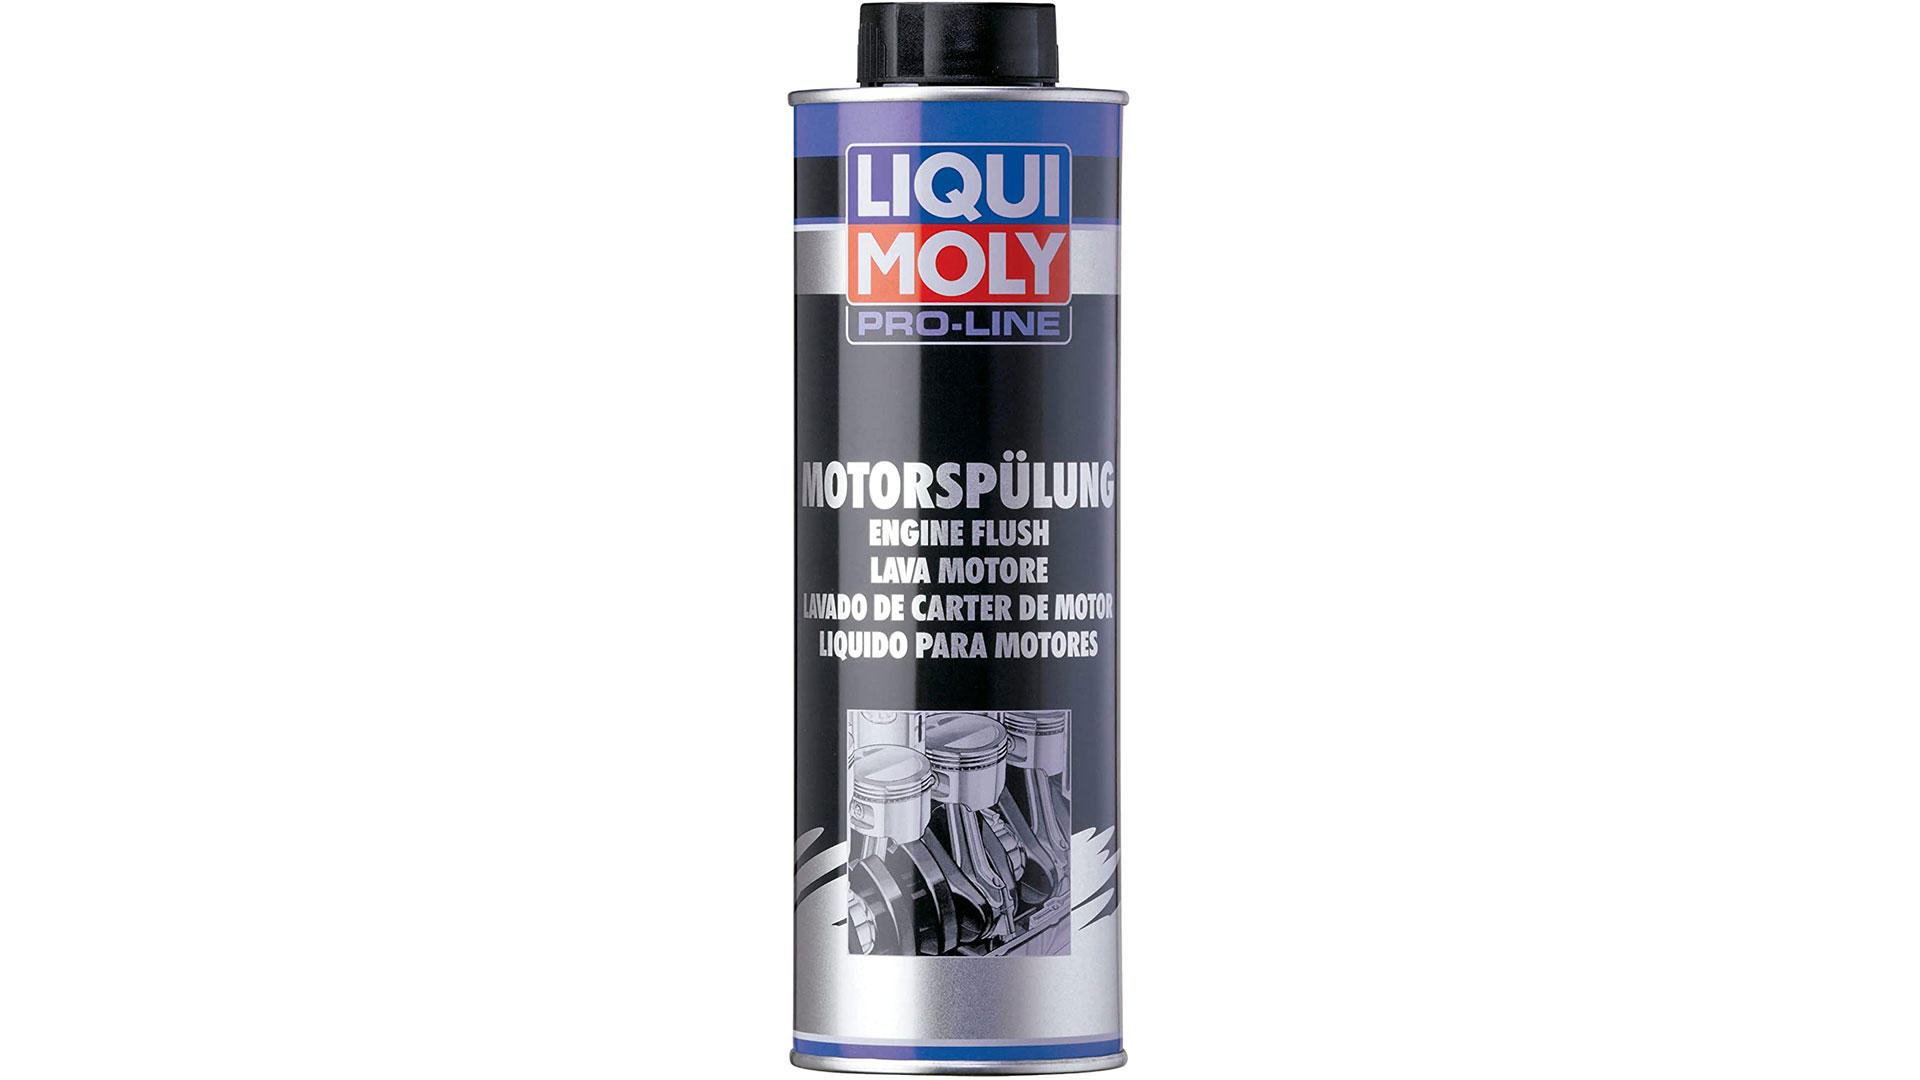 liqui moly pro line engine flush